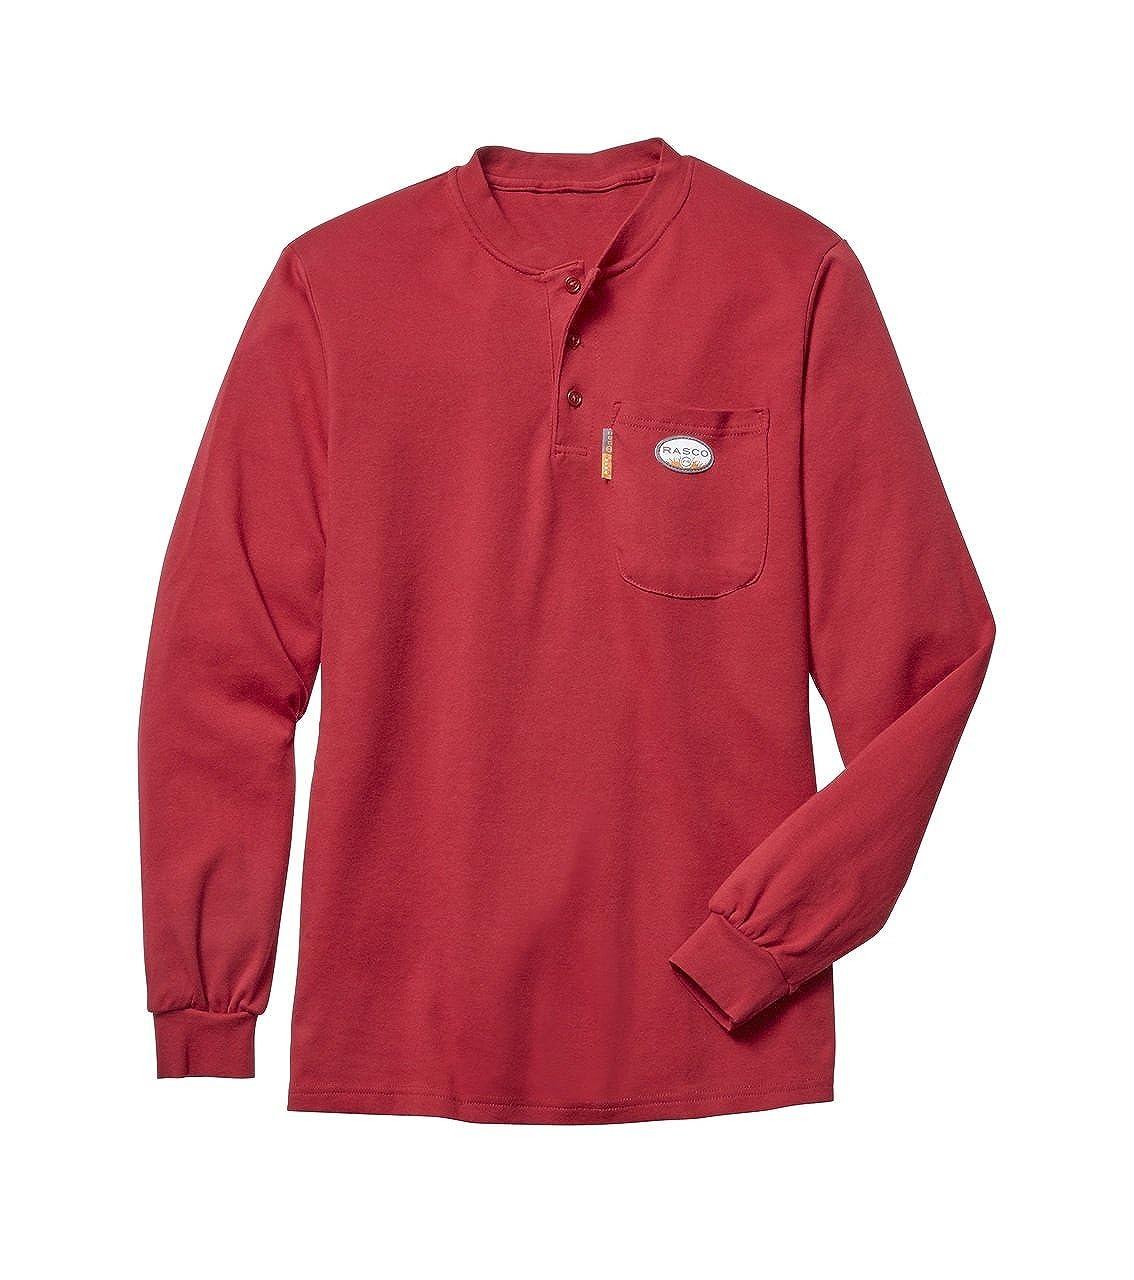 Rasco FR Henley Long Sleeve Shirt 2000030797